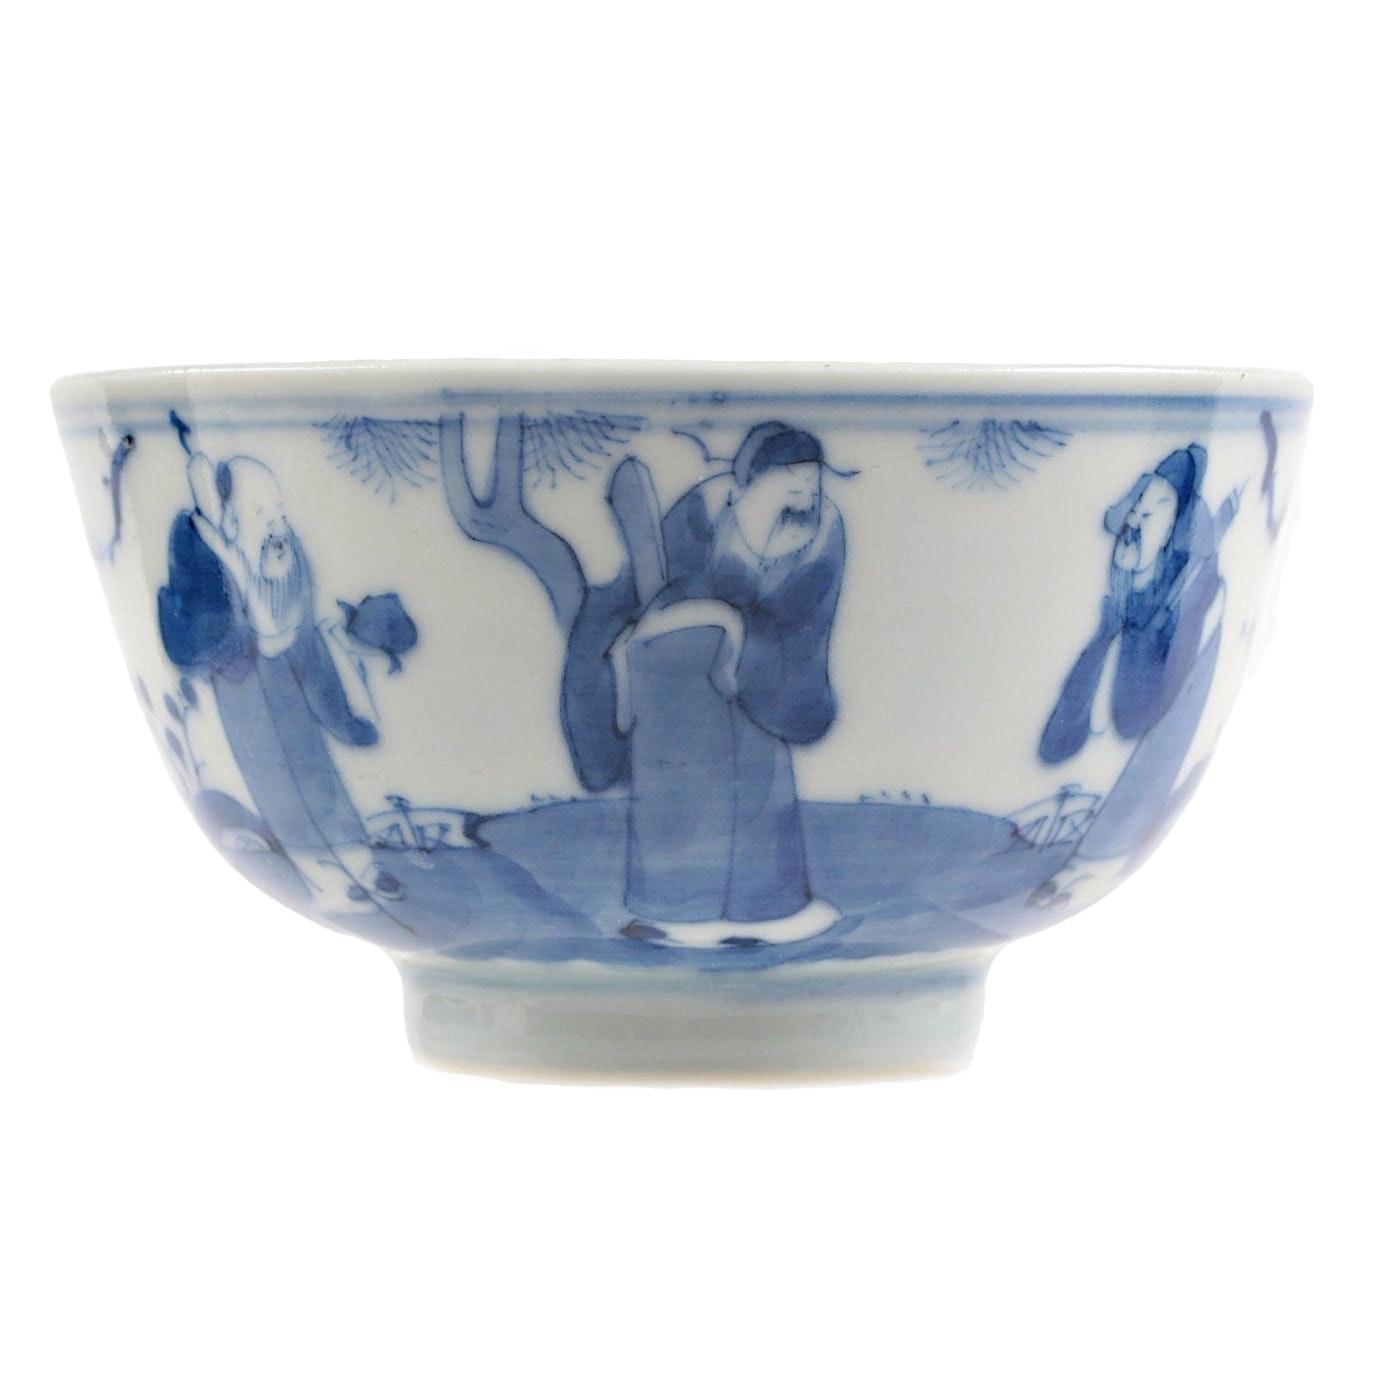 Chinese Blue and White Porcelain Three Scholars Bowl, Kangxi